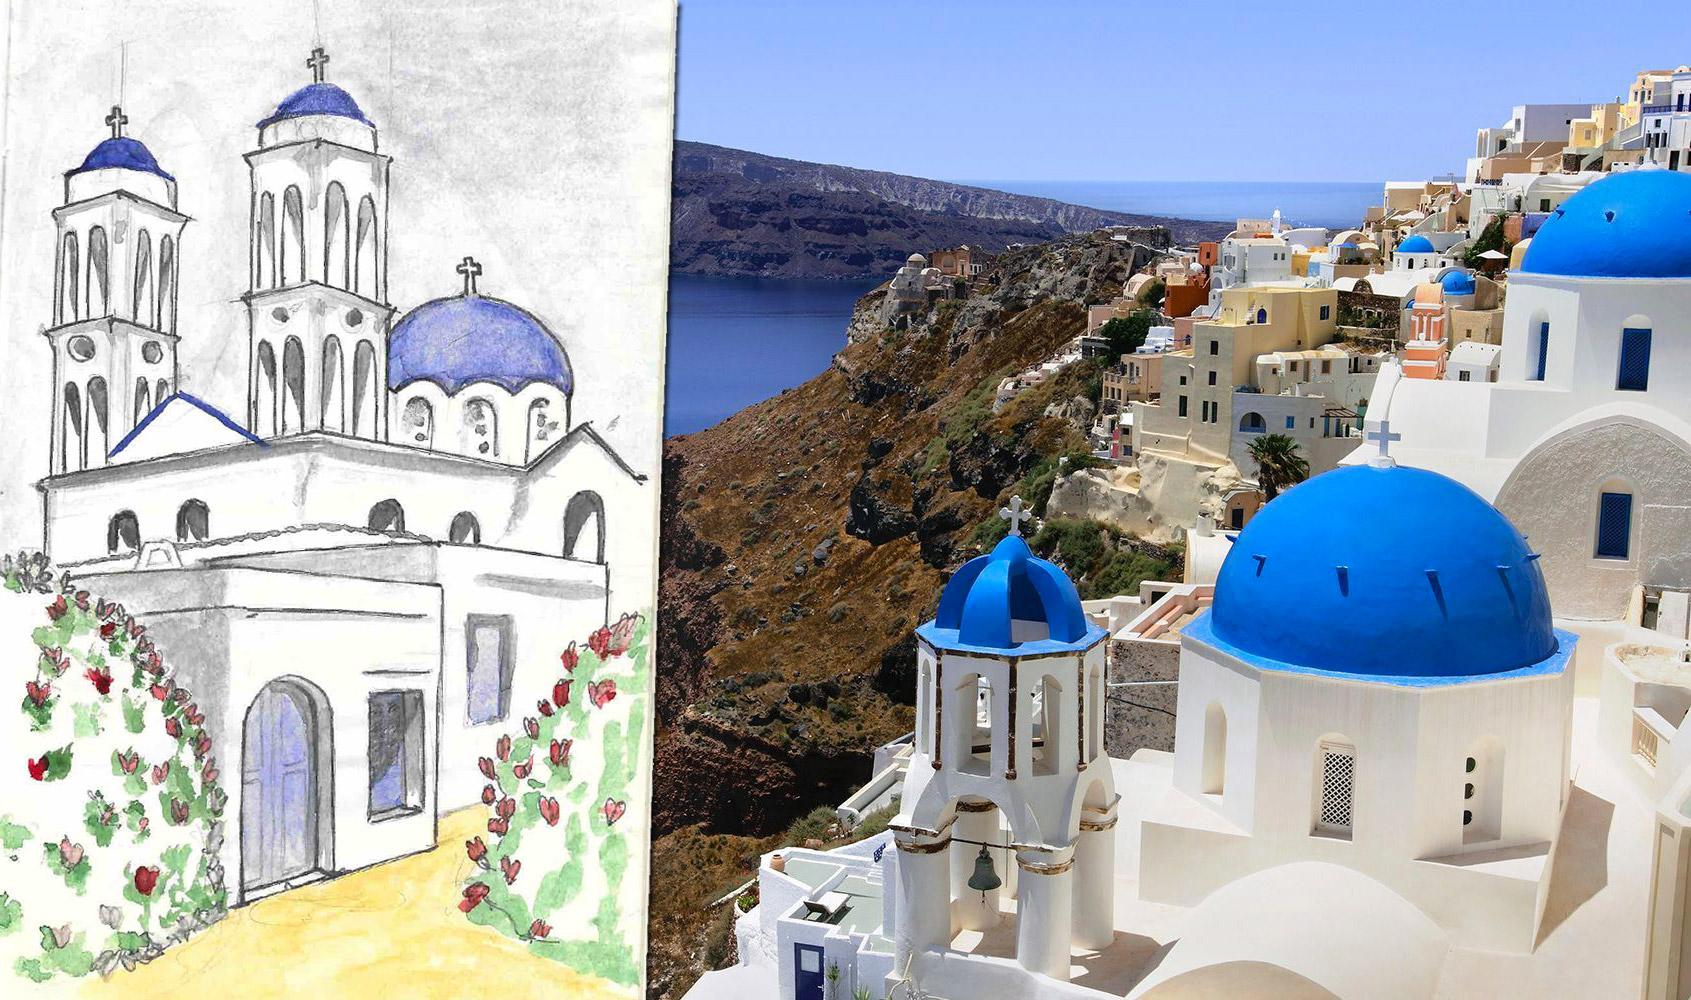 Santorini greek church gatelmand